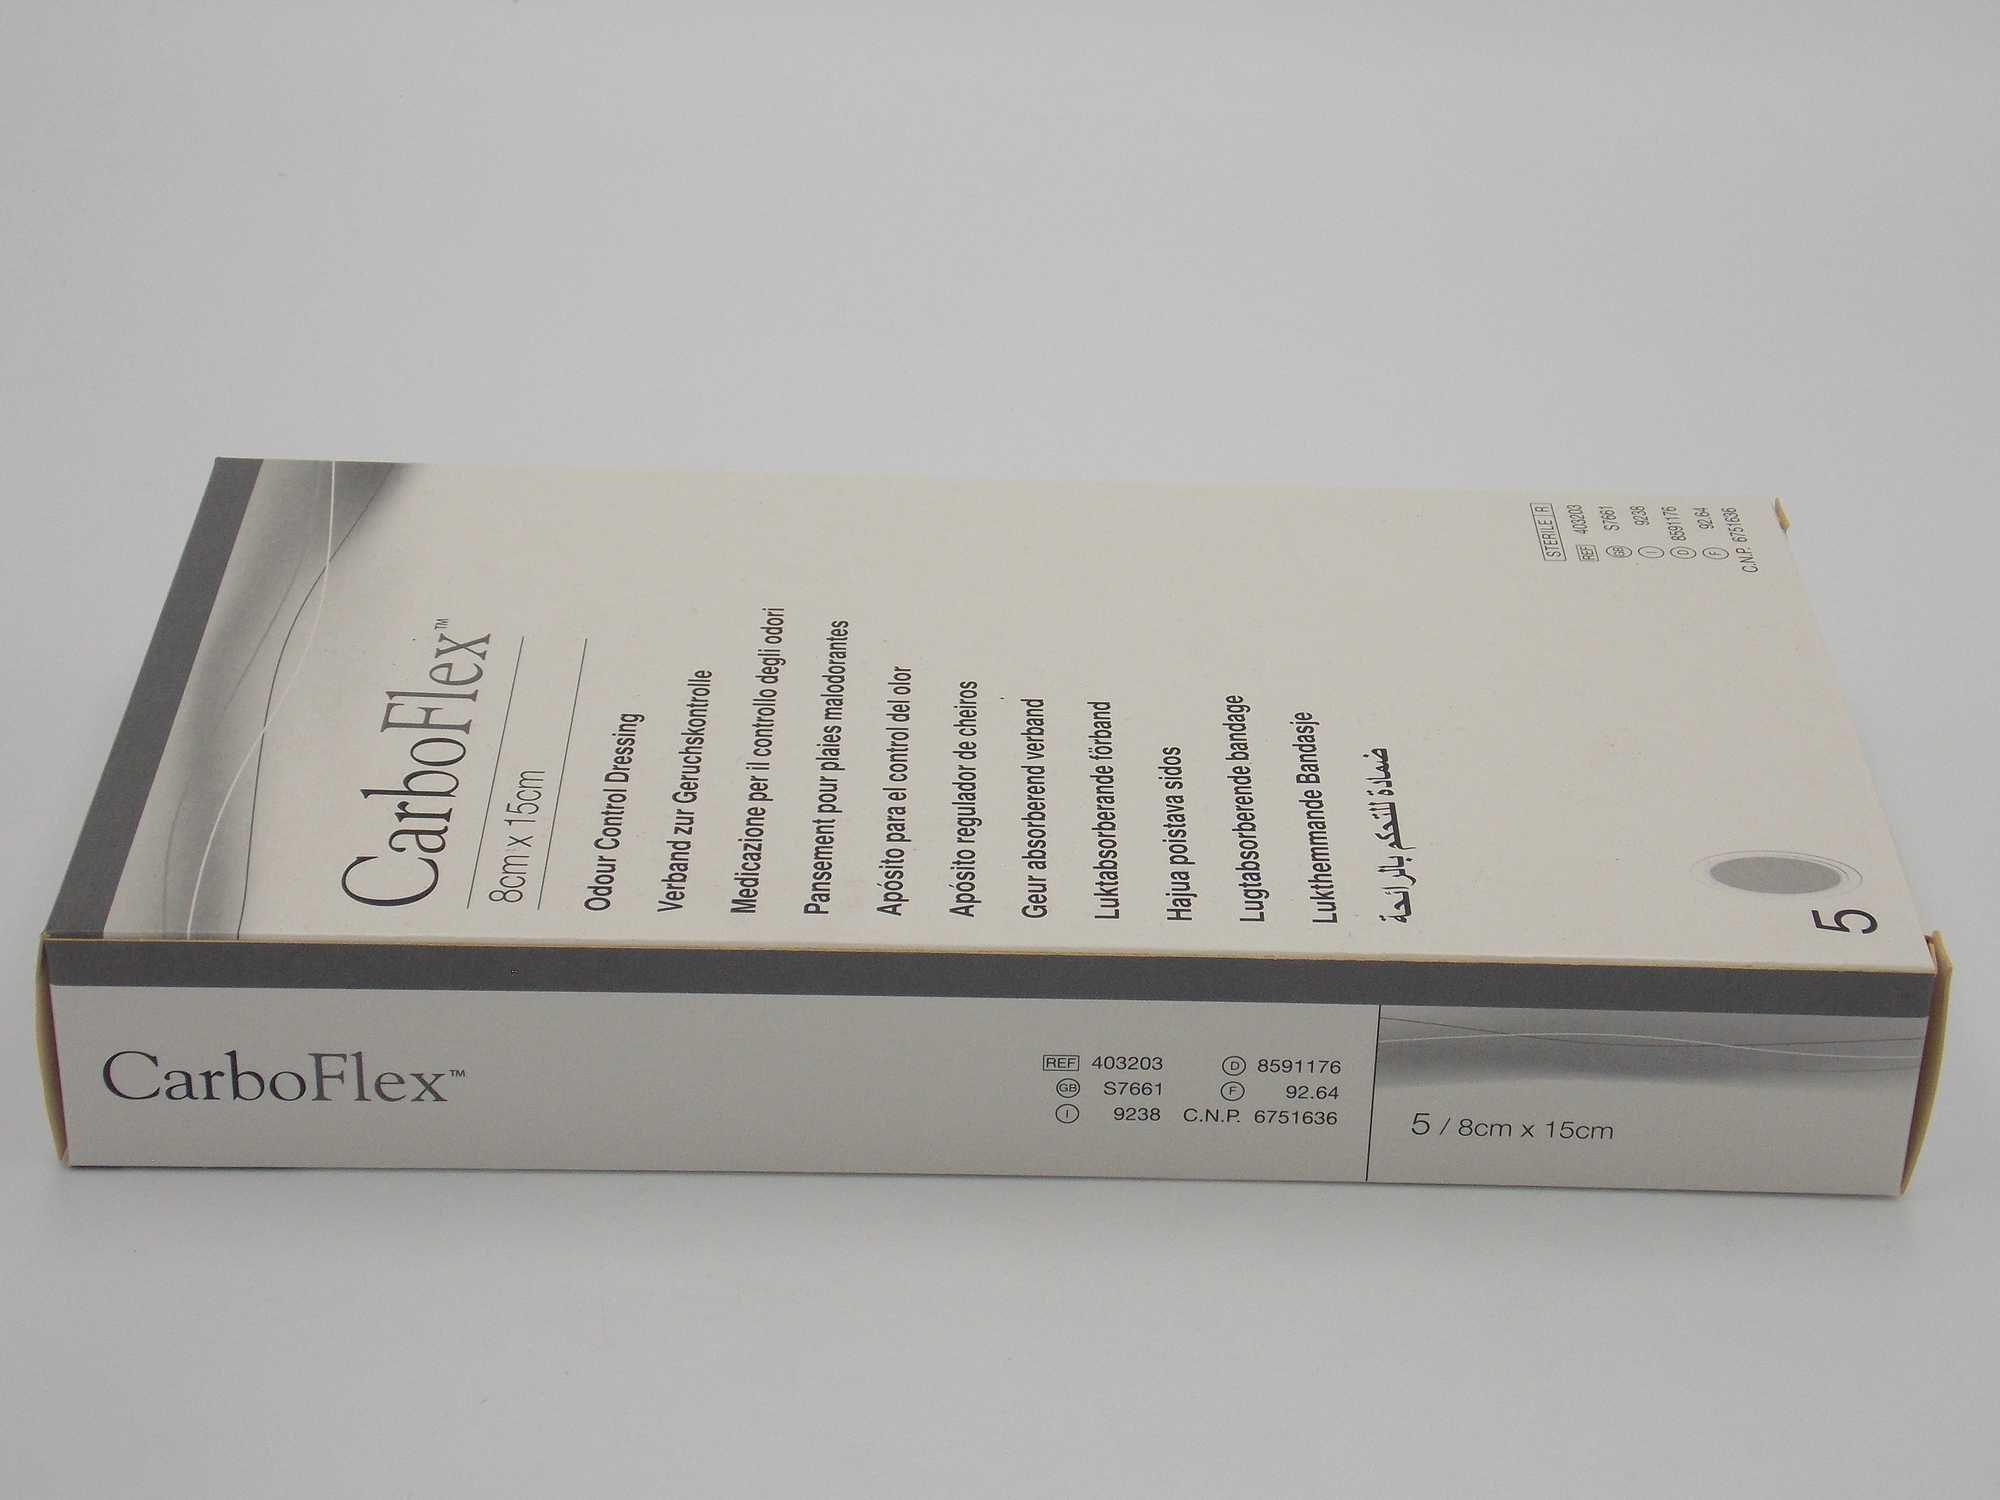 CURATIVO CARBOFLEX  8CM X 15CM OVAL 403203 (10 UNDS.) - CONVATEC